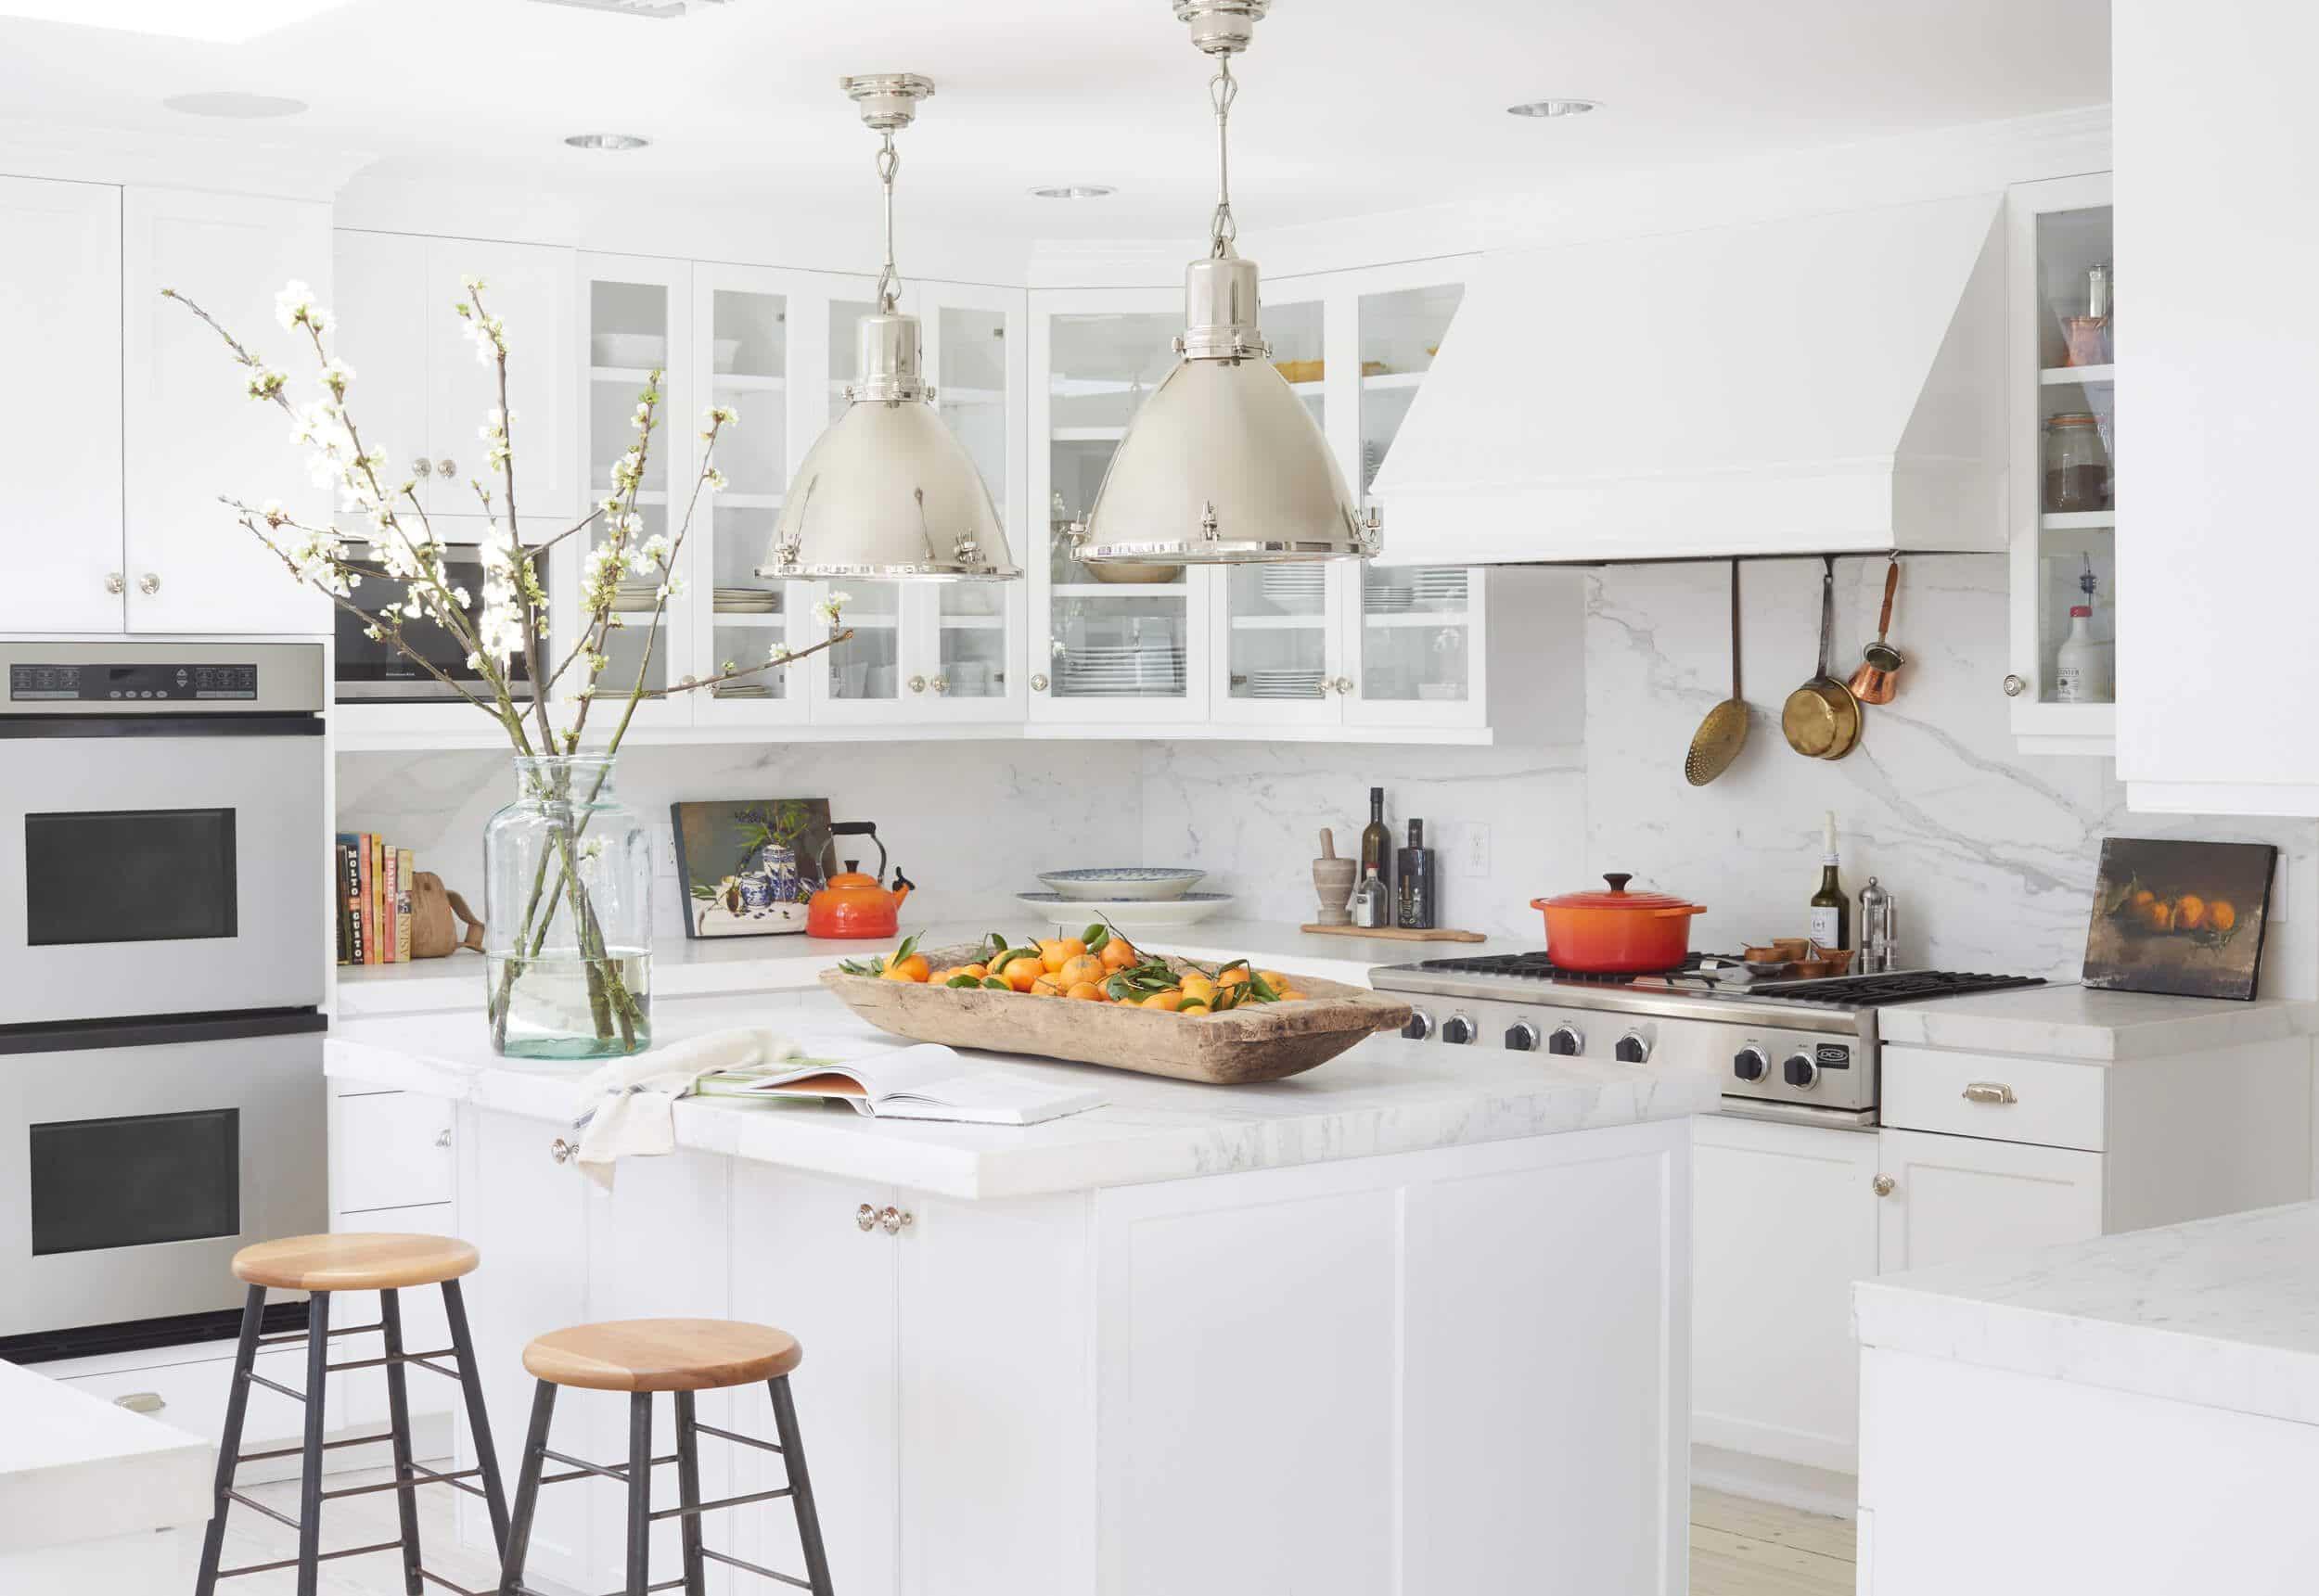 dapur modern dengan island warna putih bersih